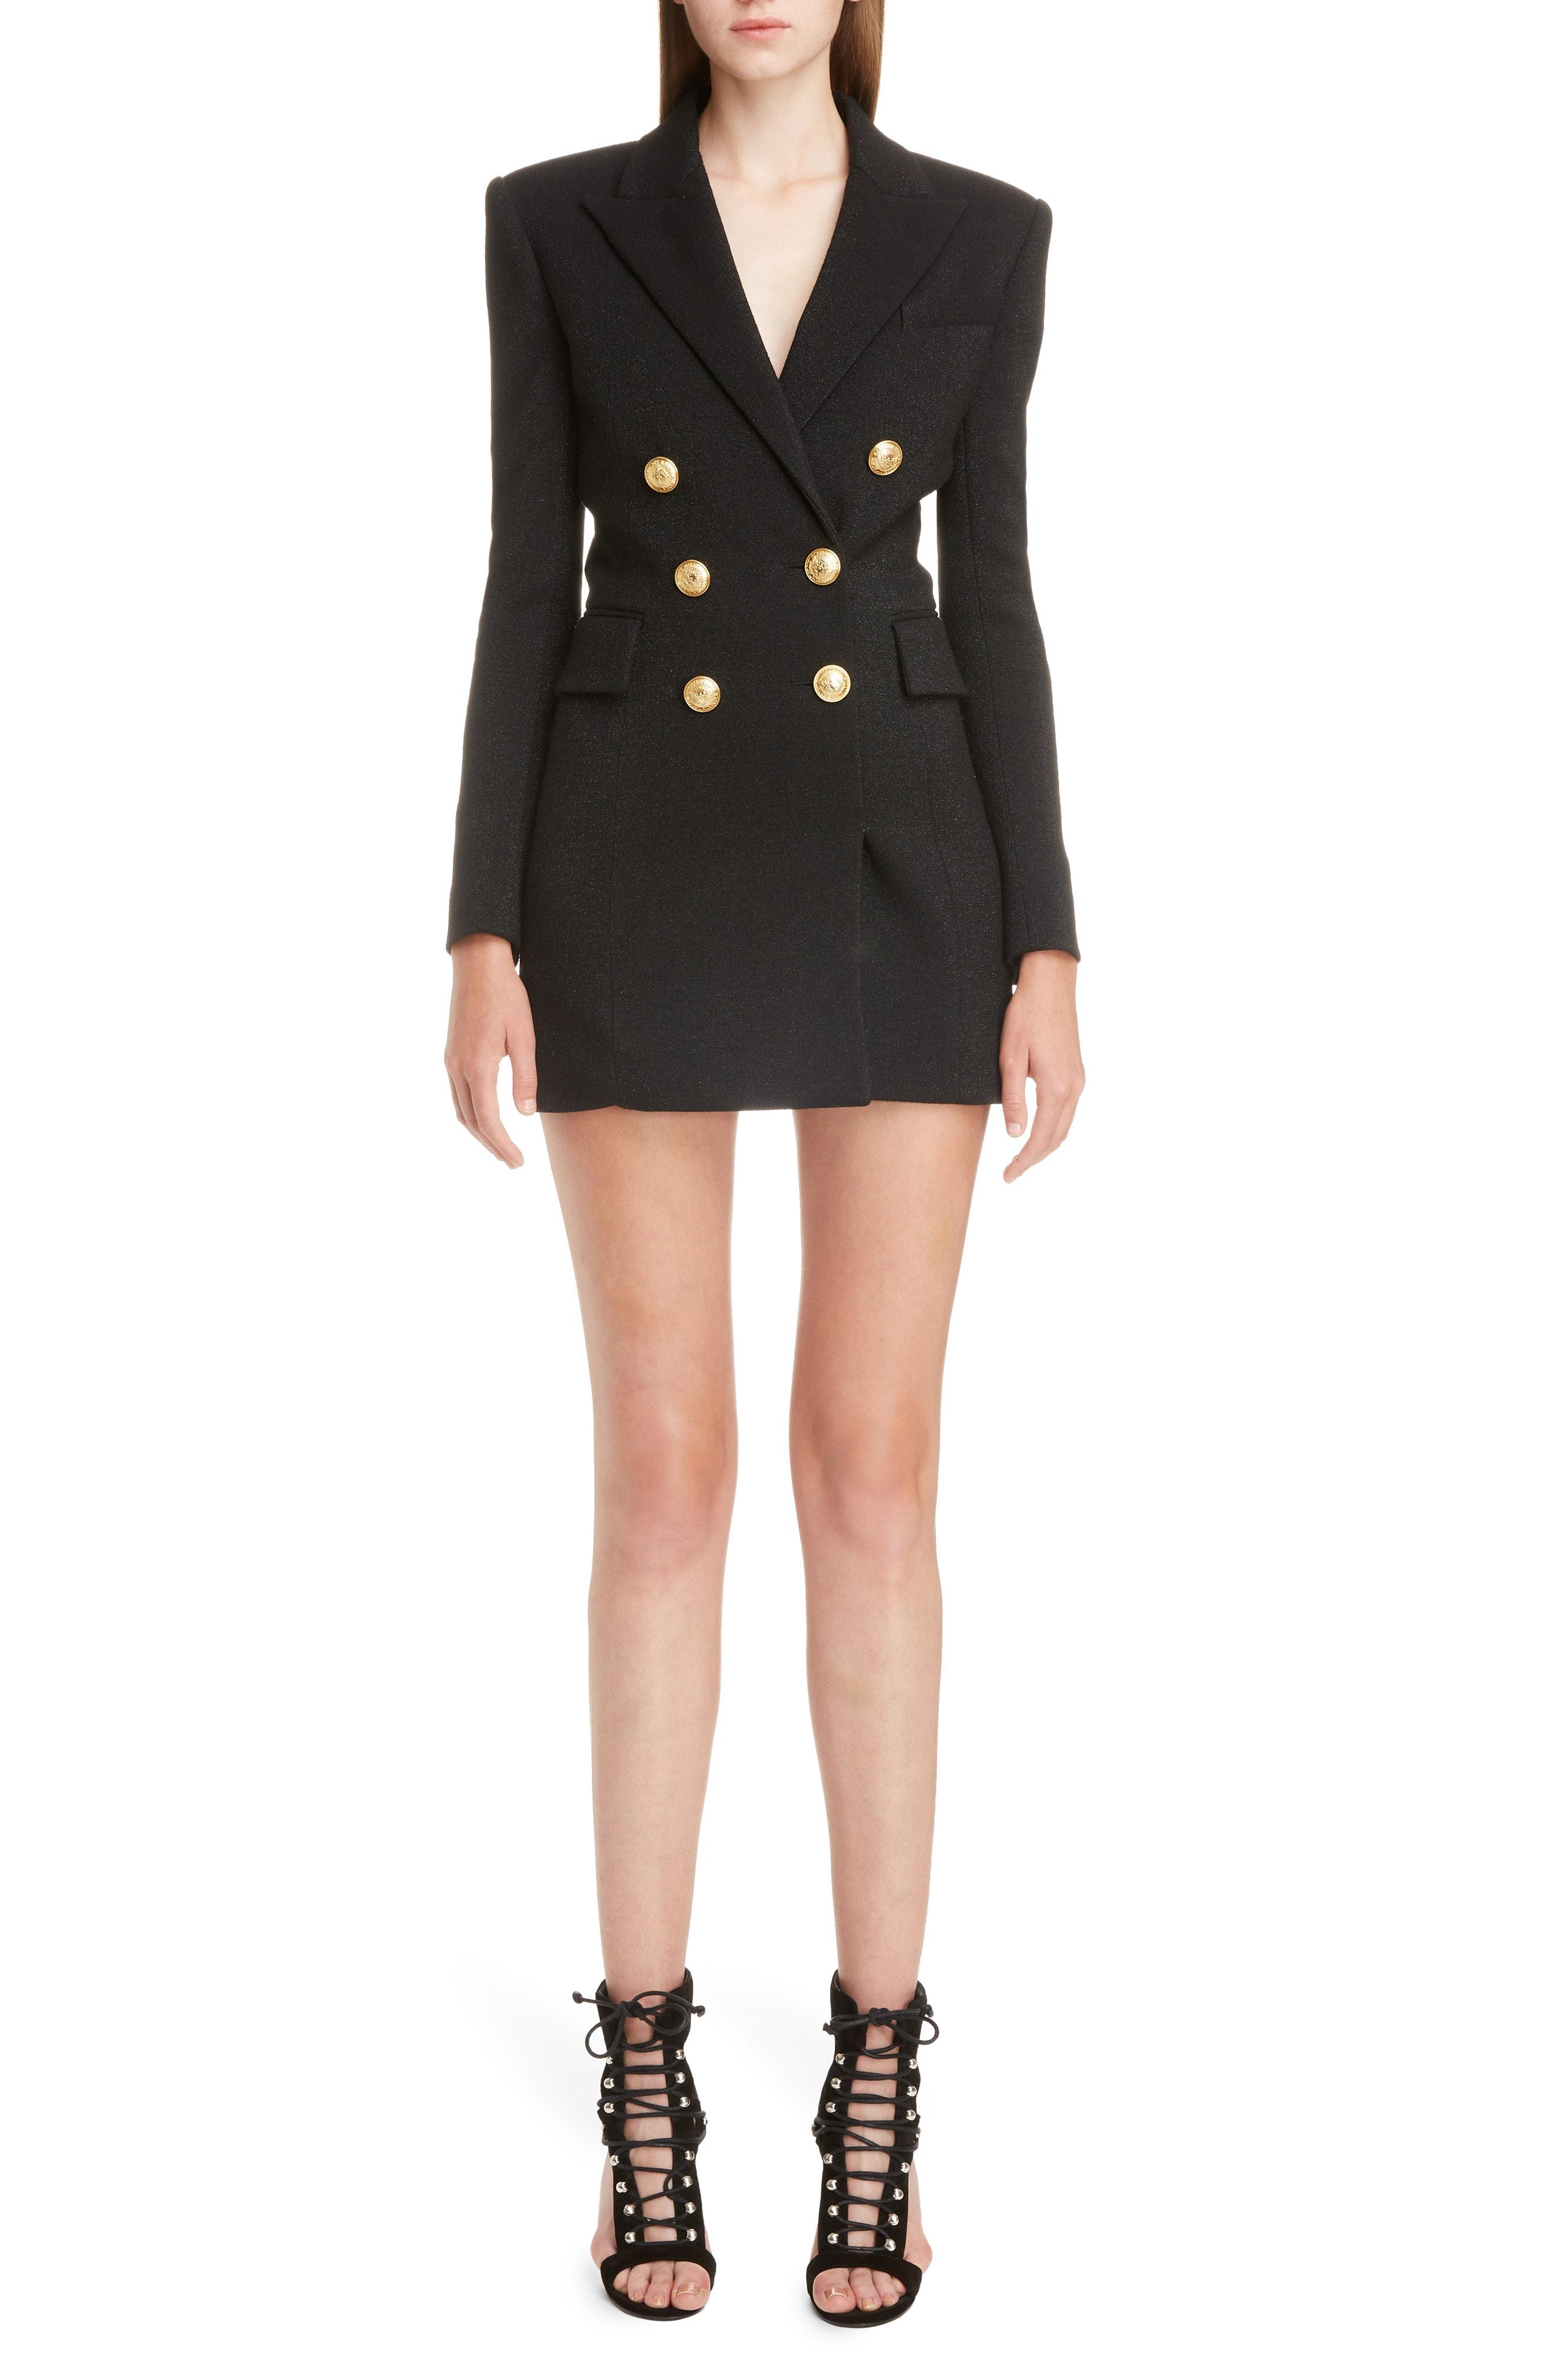 5820c804631 Balmain Button-Embellished Metallic Wool-Blend Mini Dress In Black ...